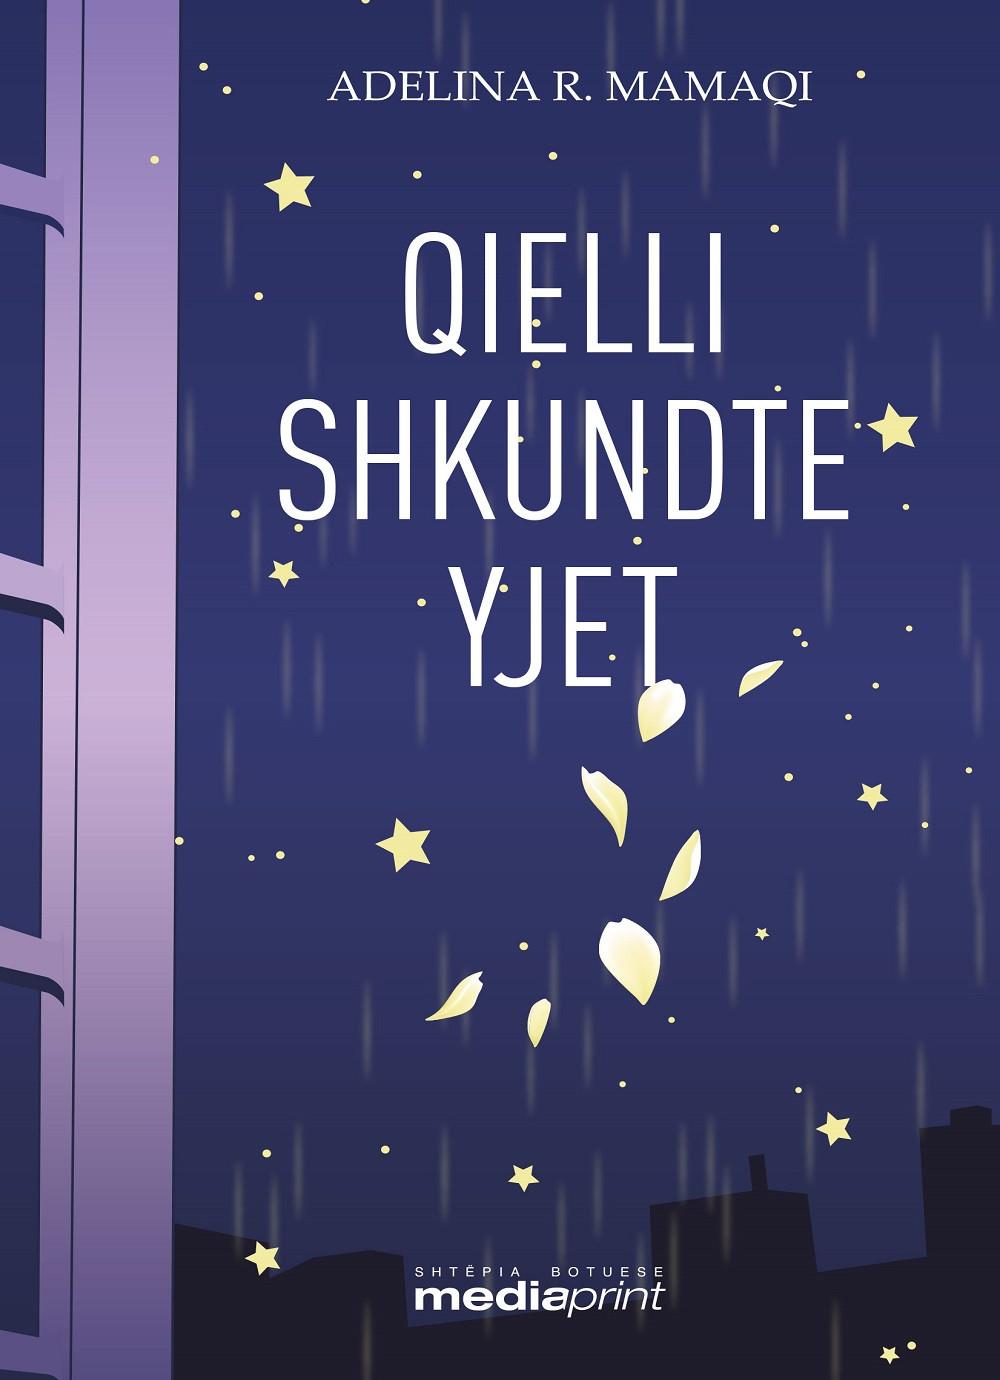 Qielli shkundte yjet